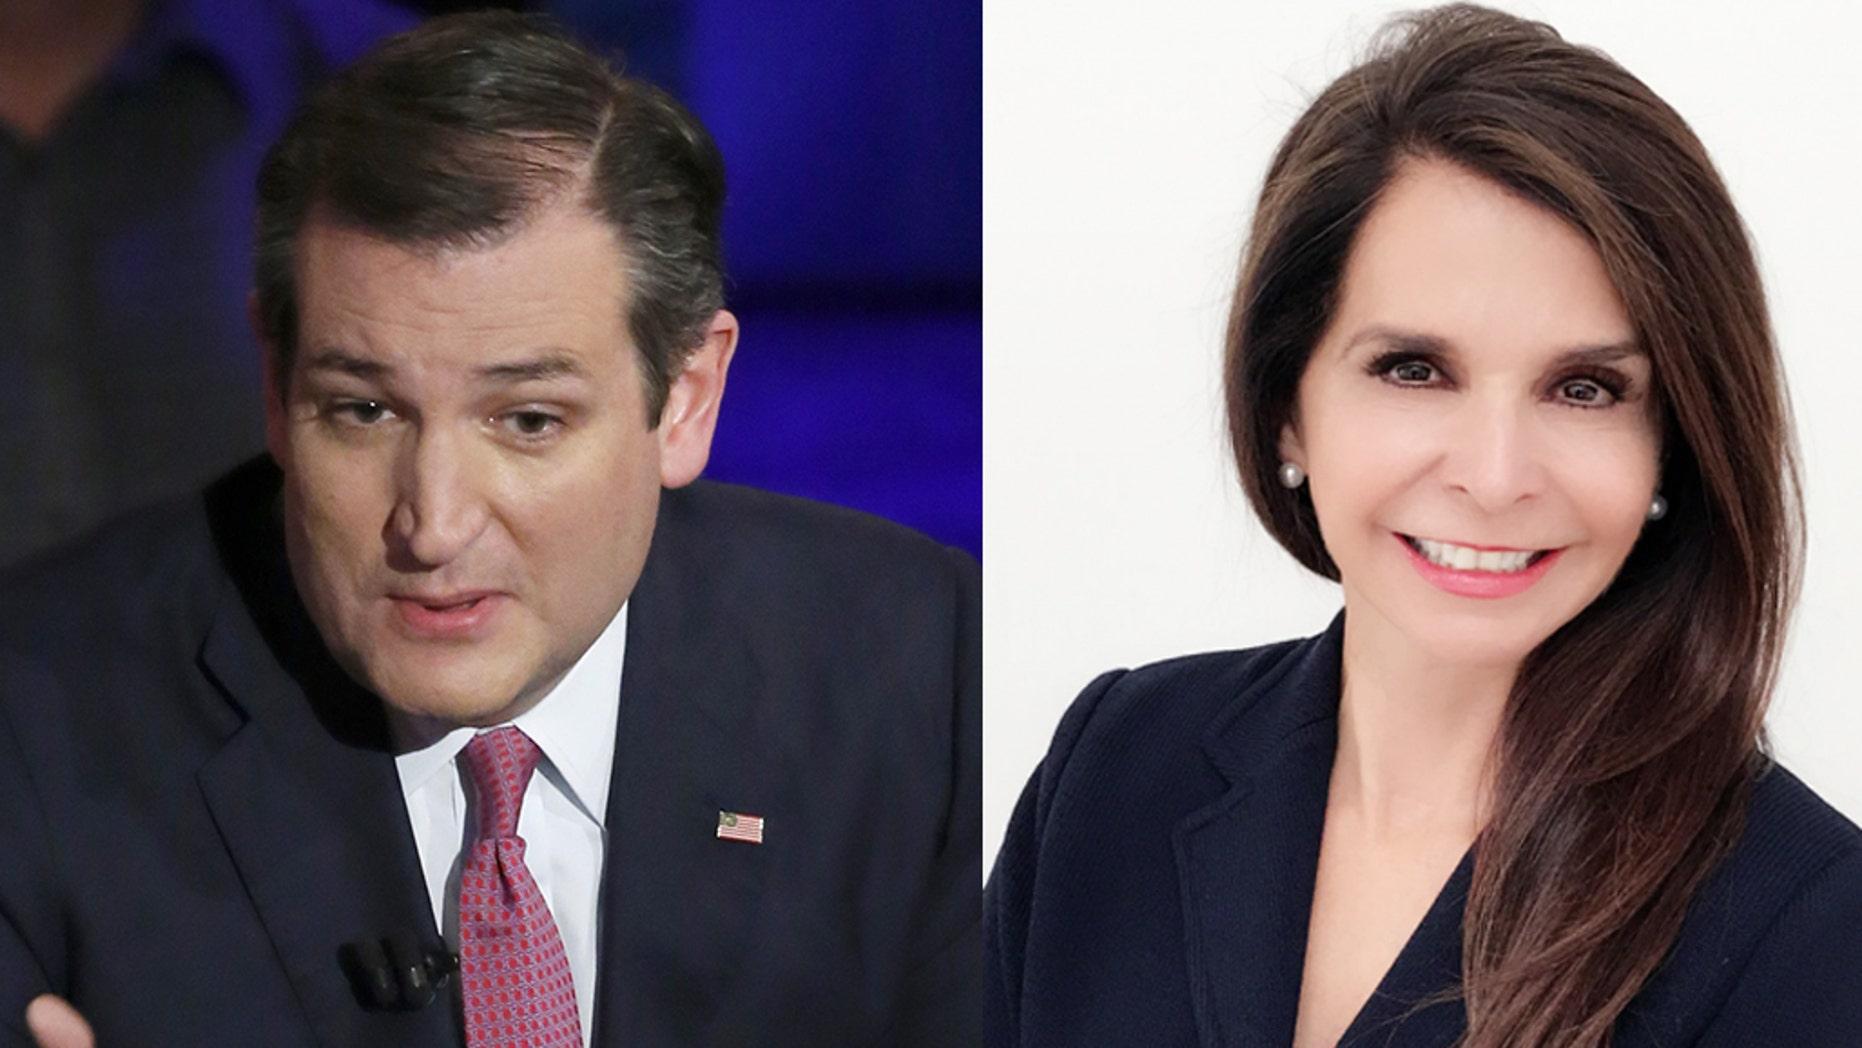 Sen. Ted Cruz (left) and Margarita Palau Hernandez. (Photos: Cruz, Getty Images; Hernandez, courtesy Margarita Palau Hernandez)